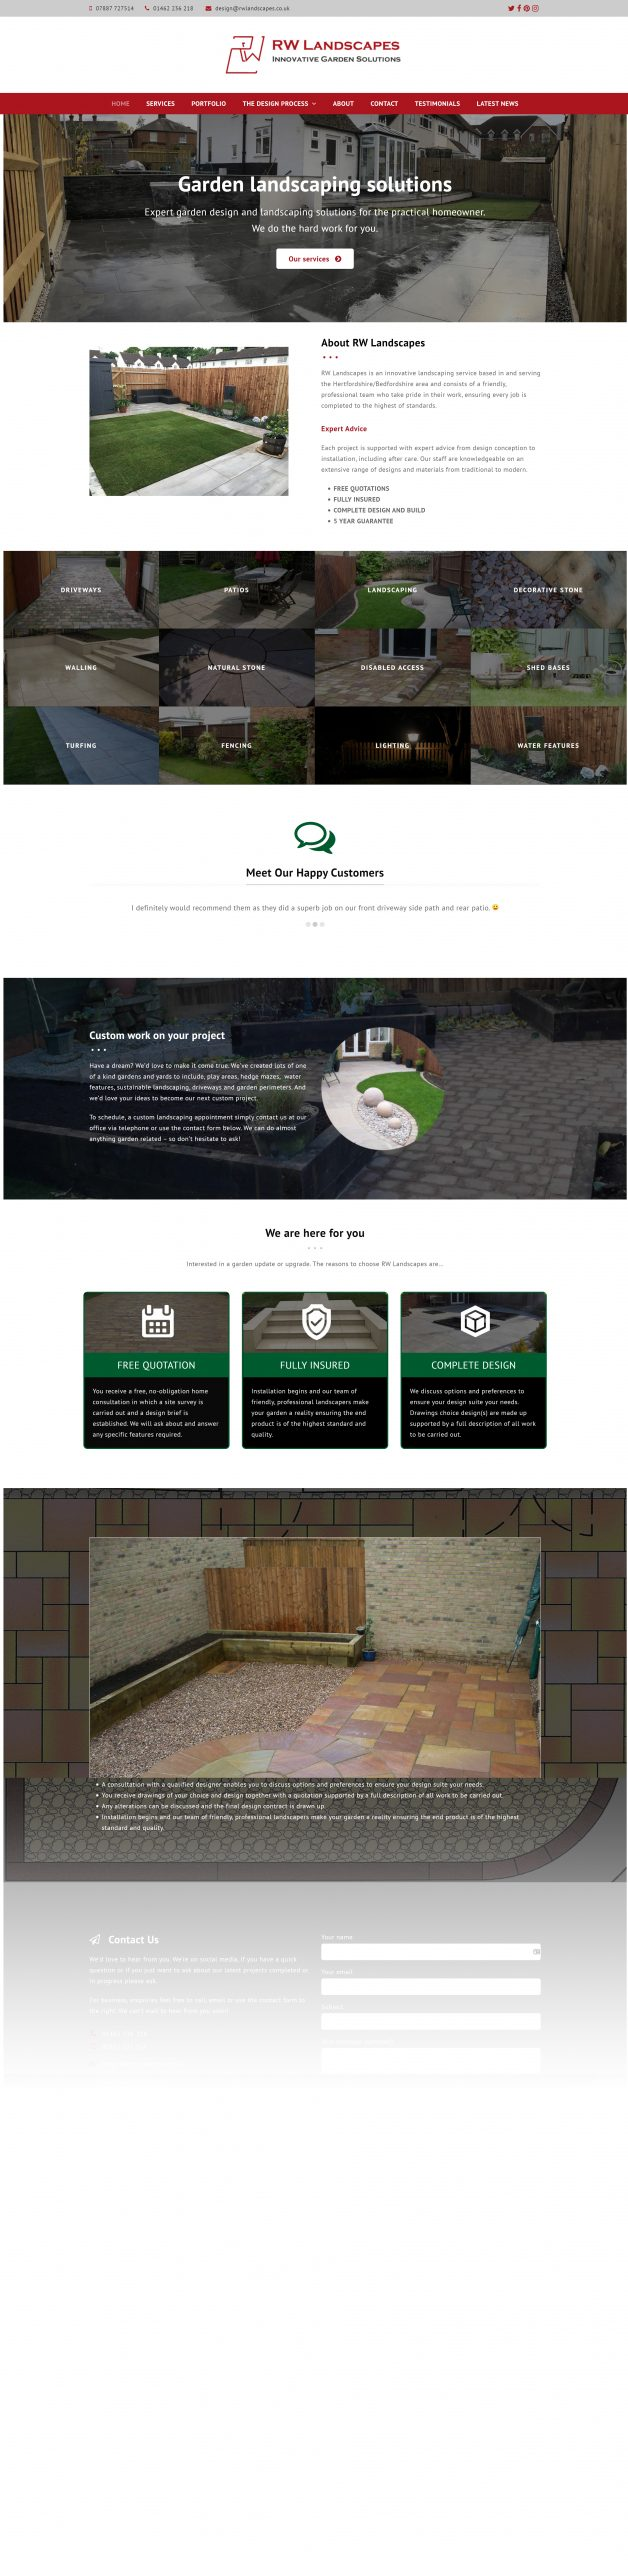 RW Landscapes website version 02 - 2021 Homepage